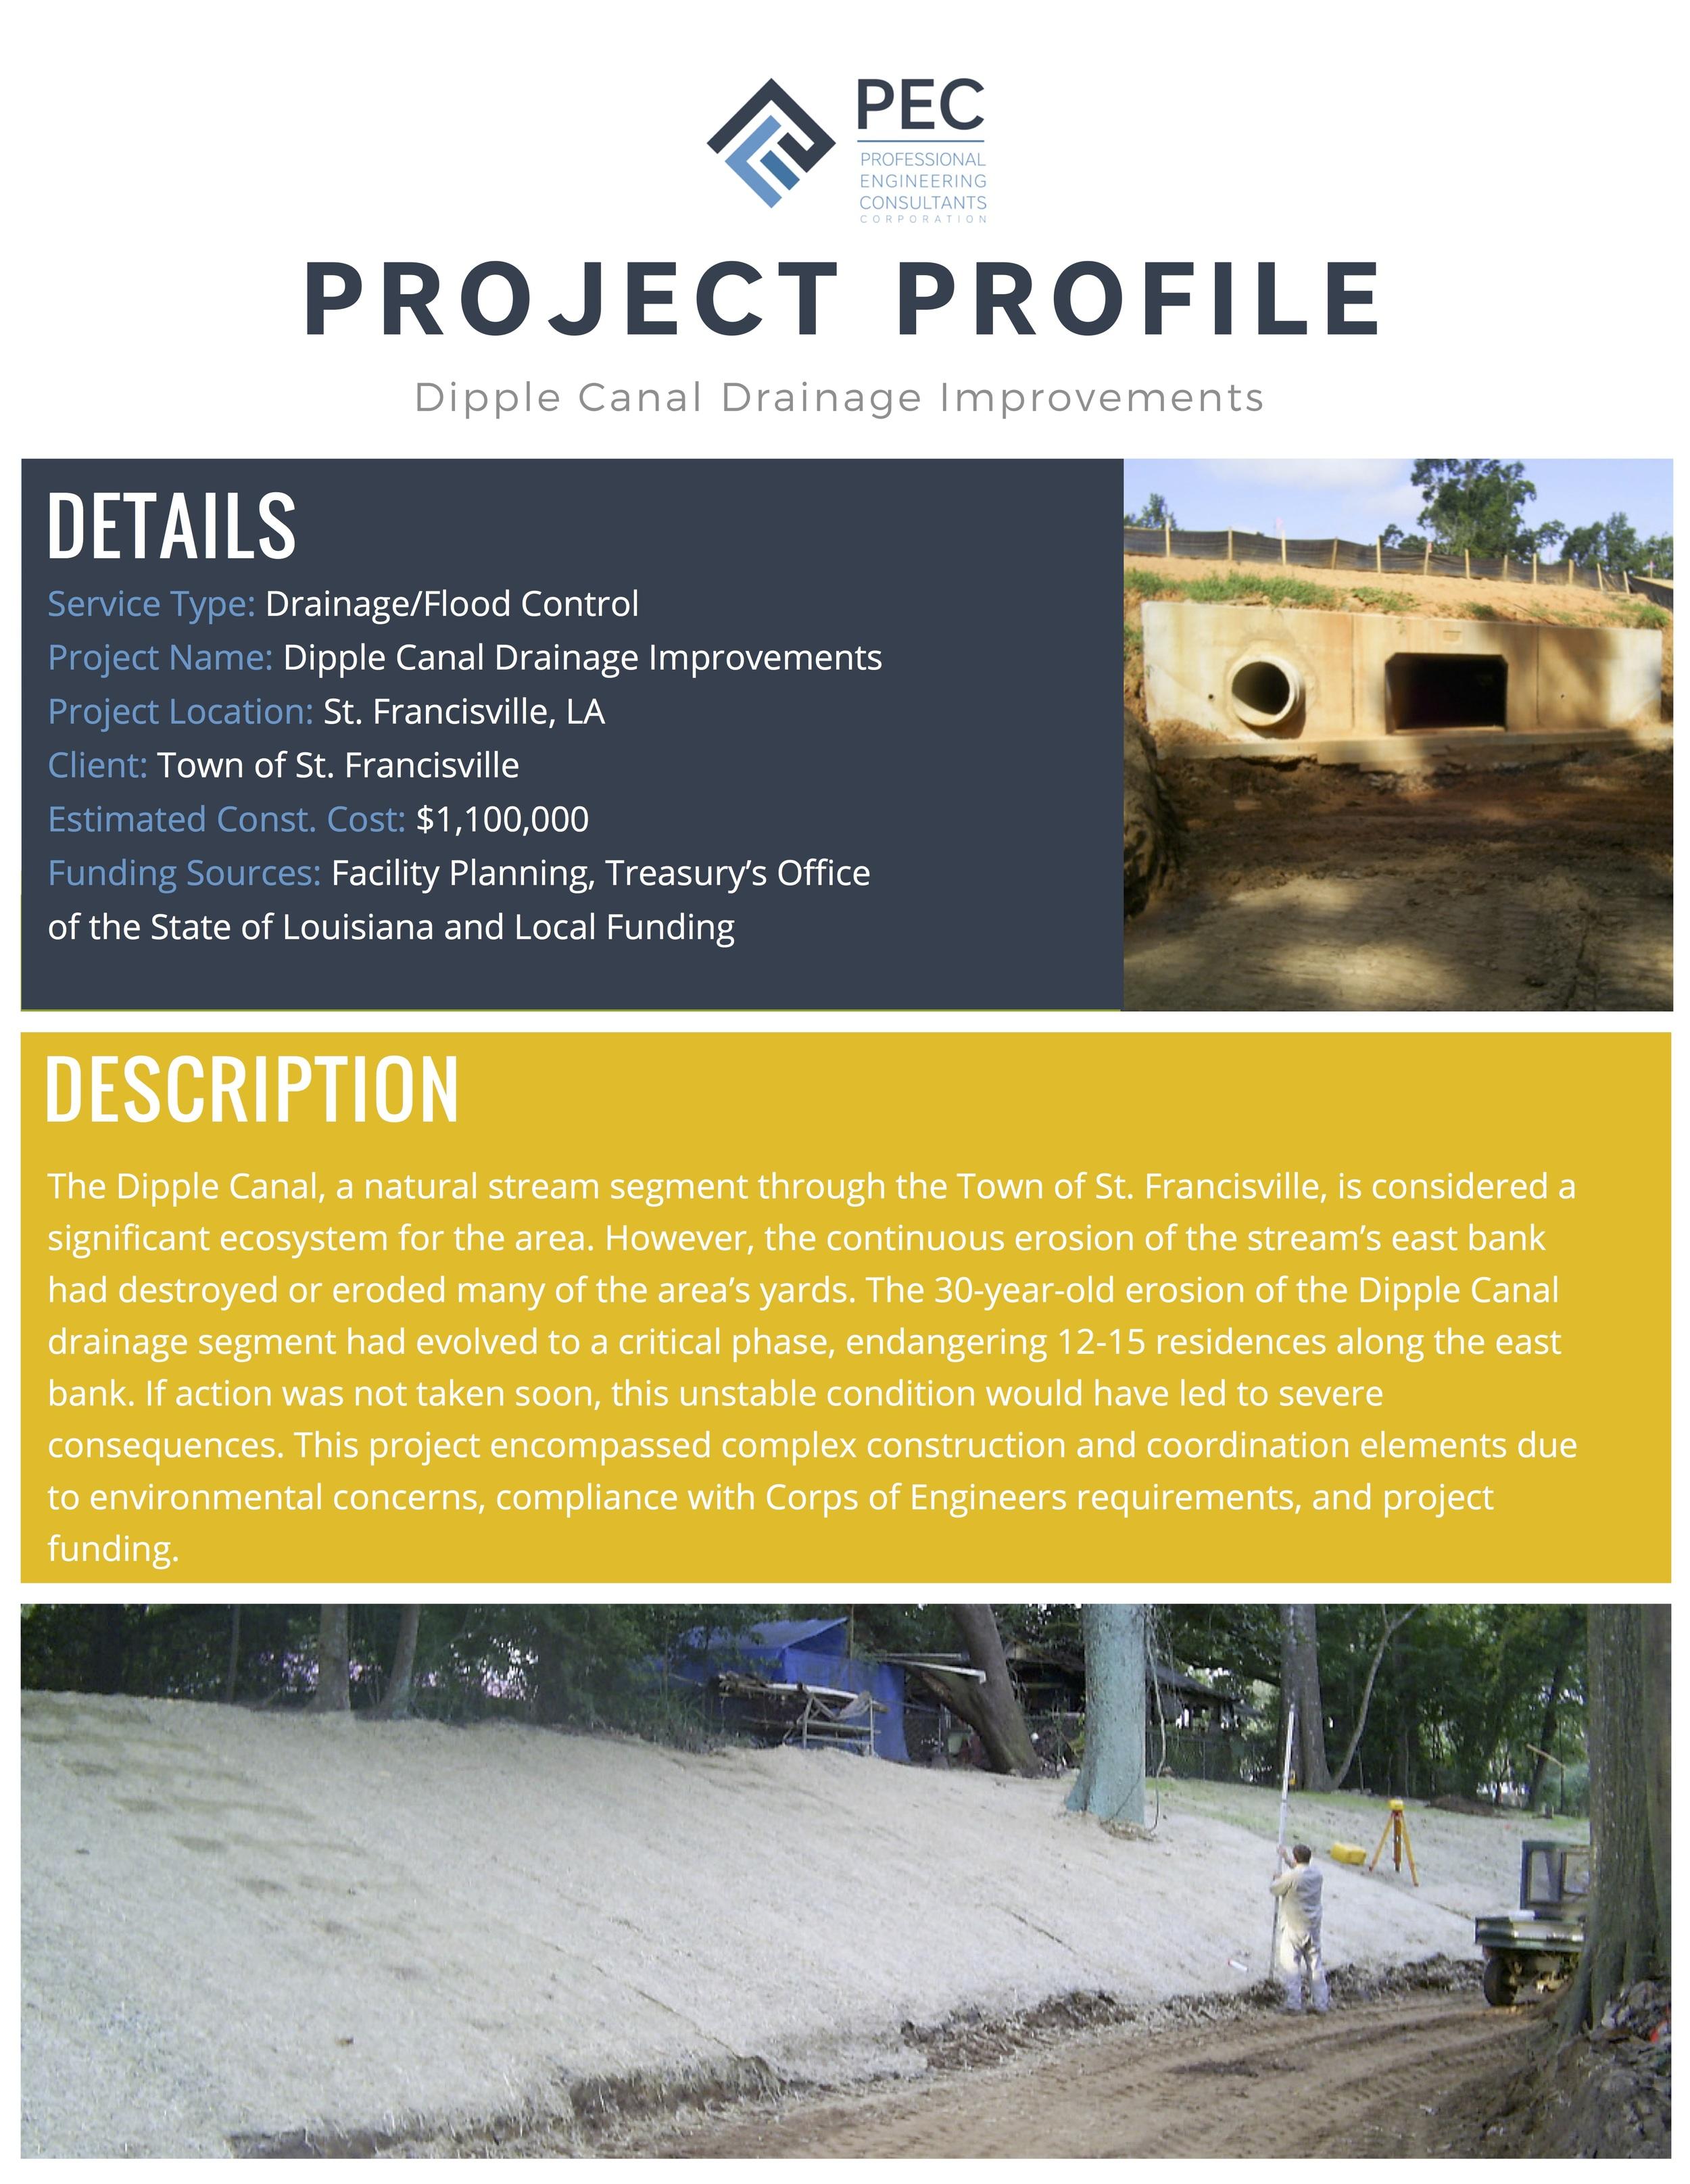 Project Profile_DippleCanalFINAL.jpg